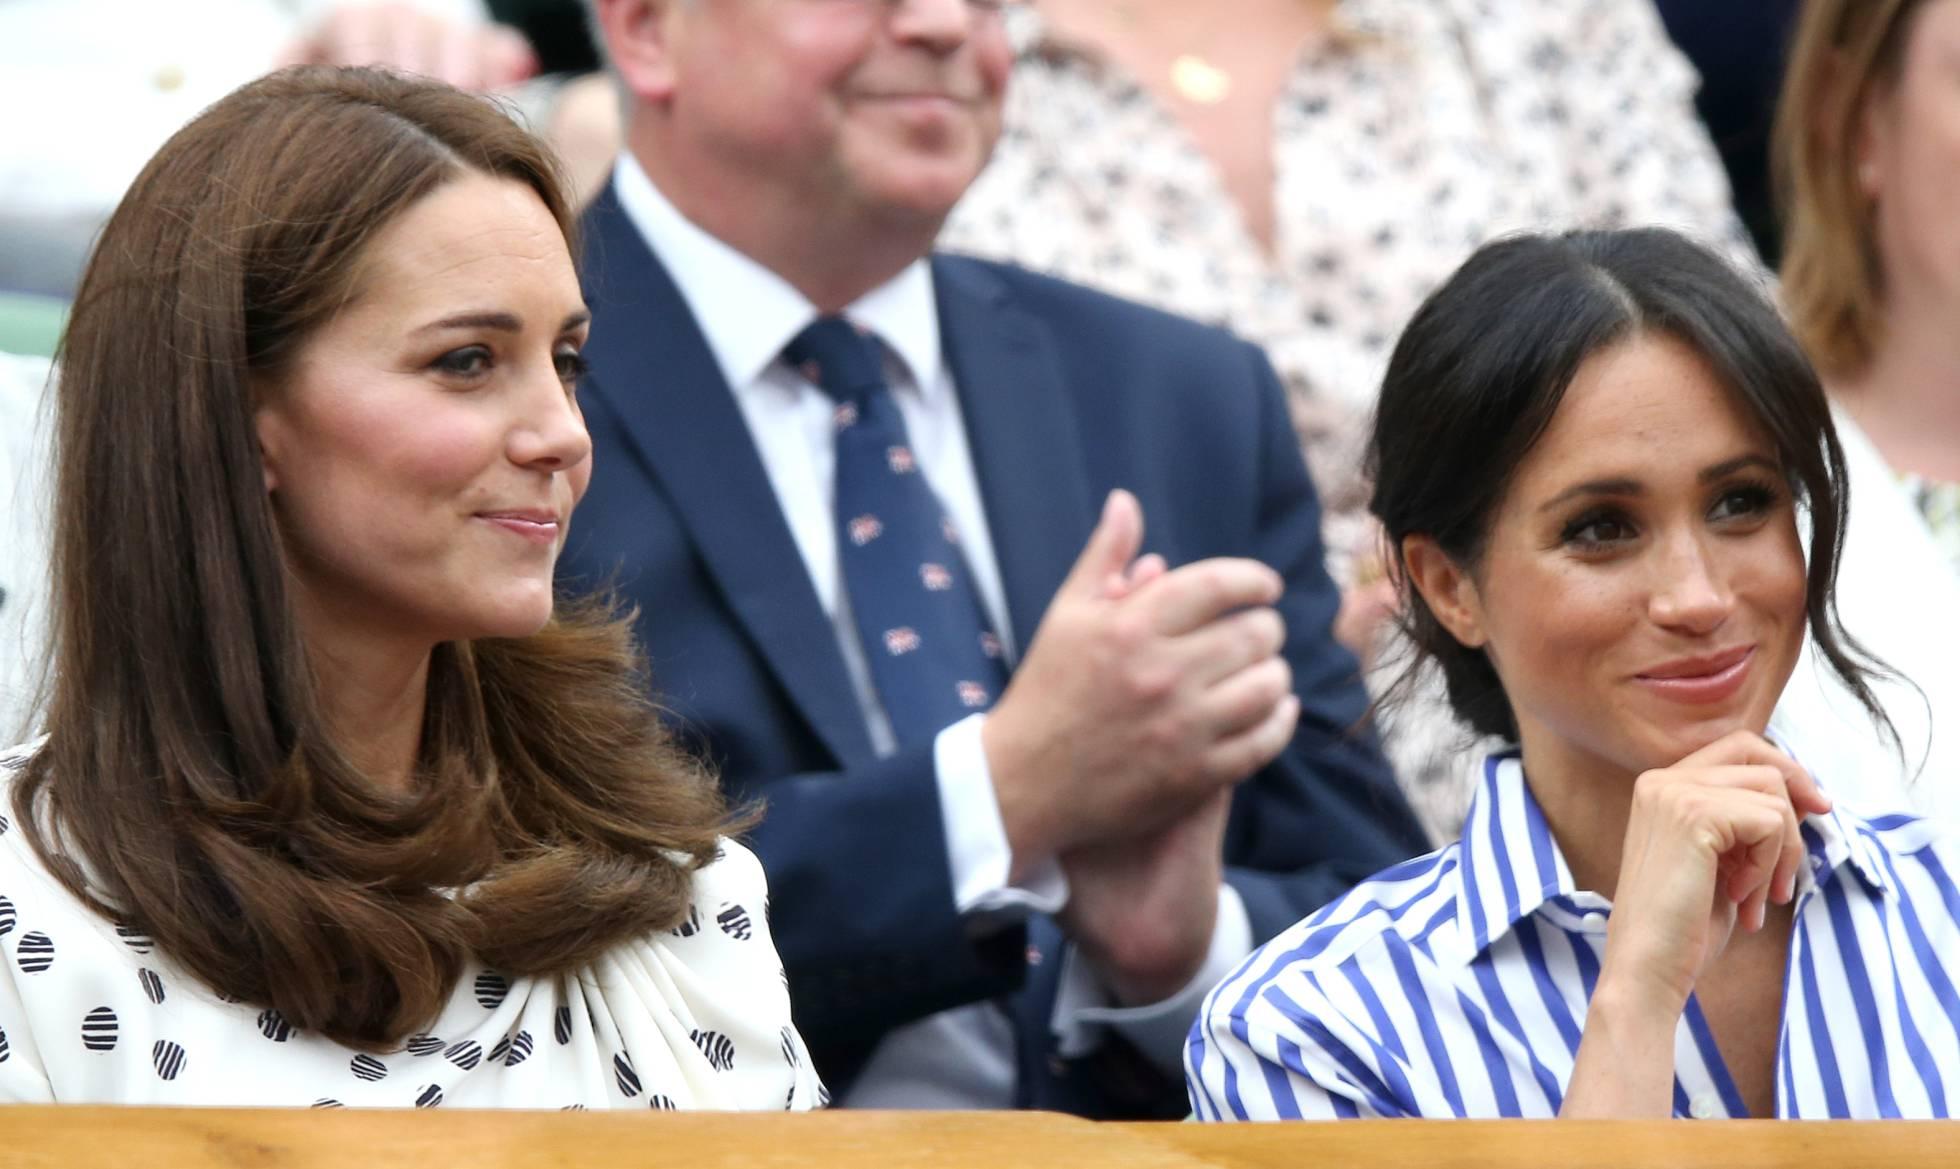 La razón del enfado entre Meghan Markle y Kate Middleton